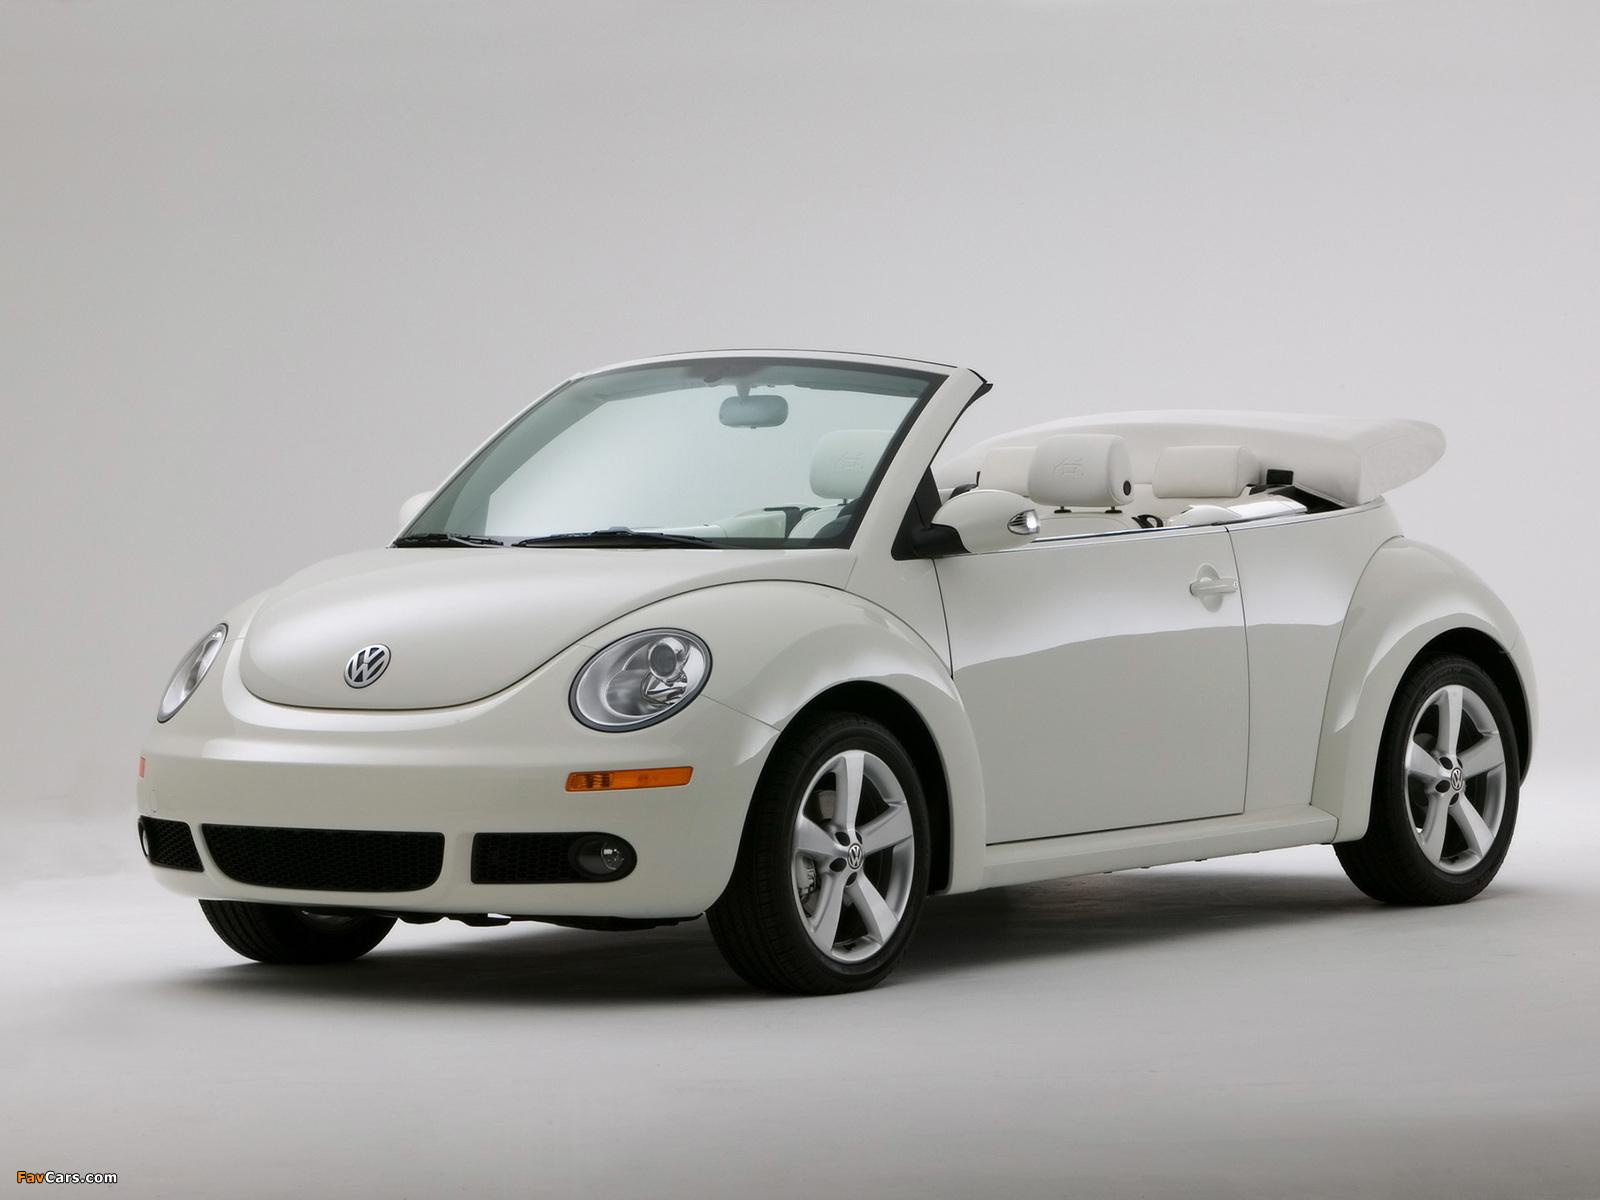 Volkswagen New Beetle Convertible Triple White 2007 photos (1600 x 1200)